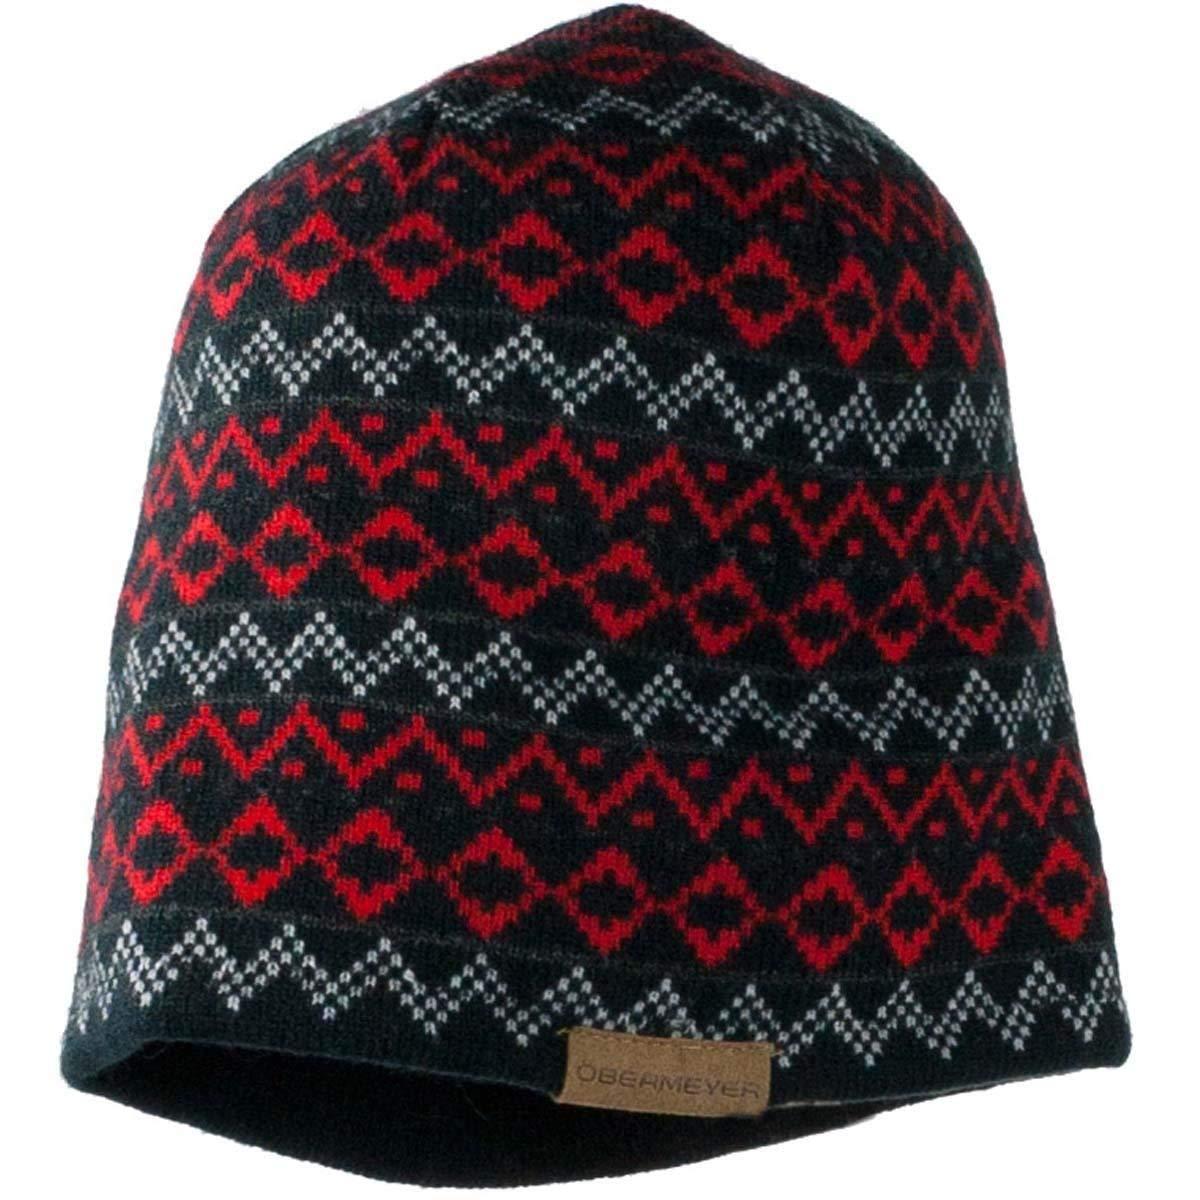 915c780b586 Get Quotations · Obermeyer Mountain Knit Hat Men s